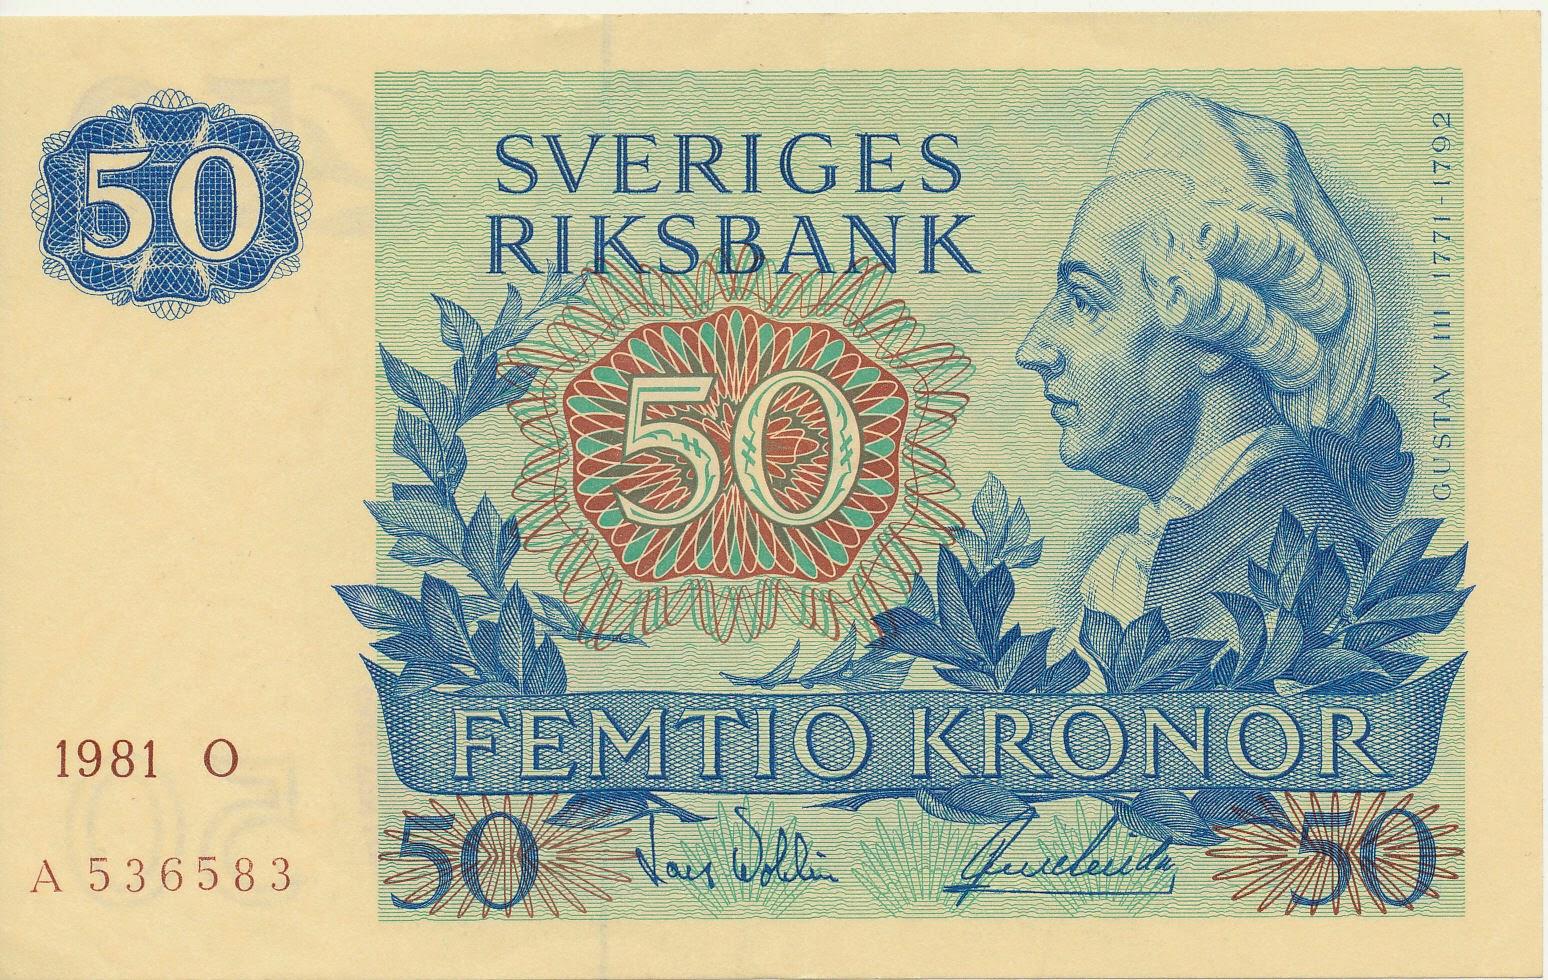 Sweden banknotes 50 Swedish Krona note 1981 King Gustav III of Sweden